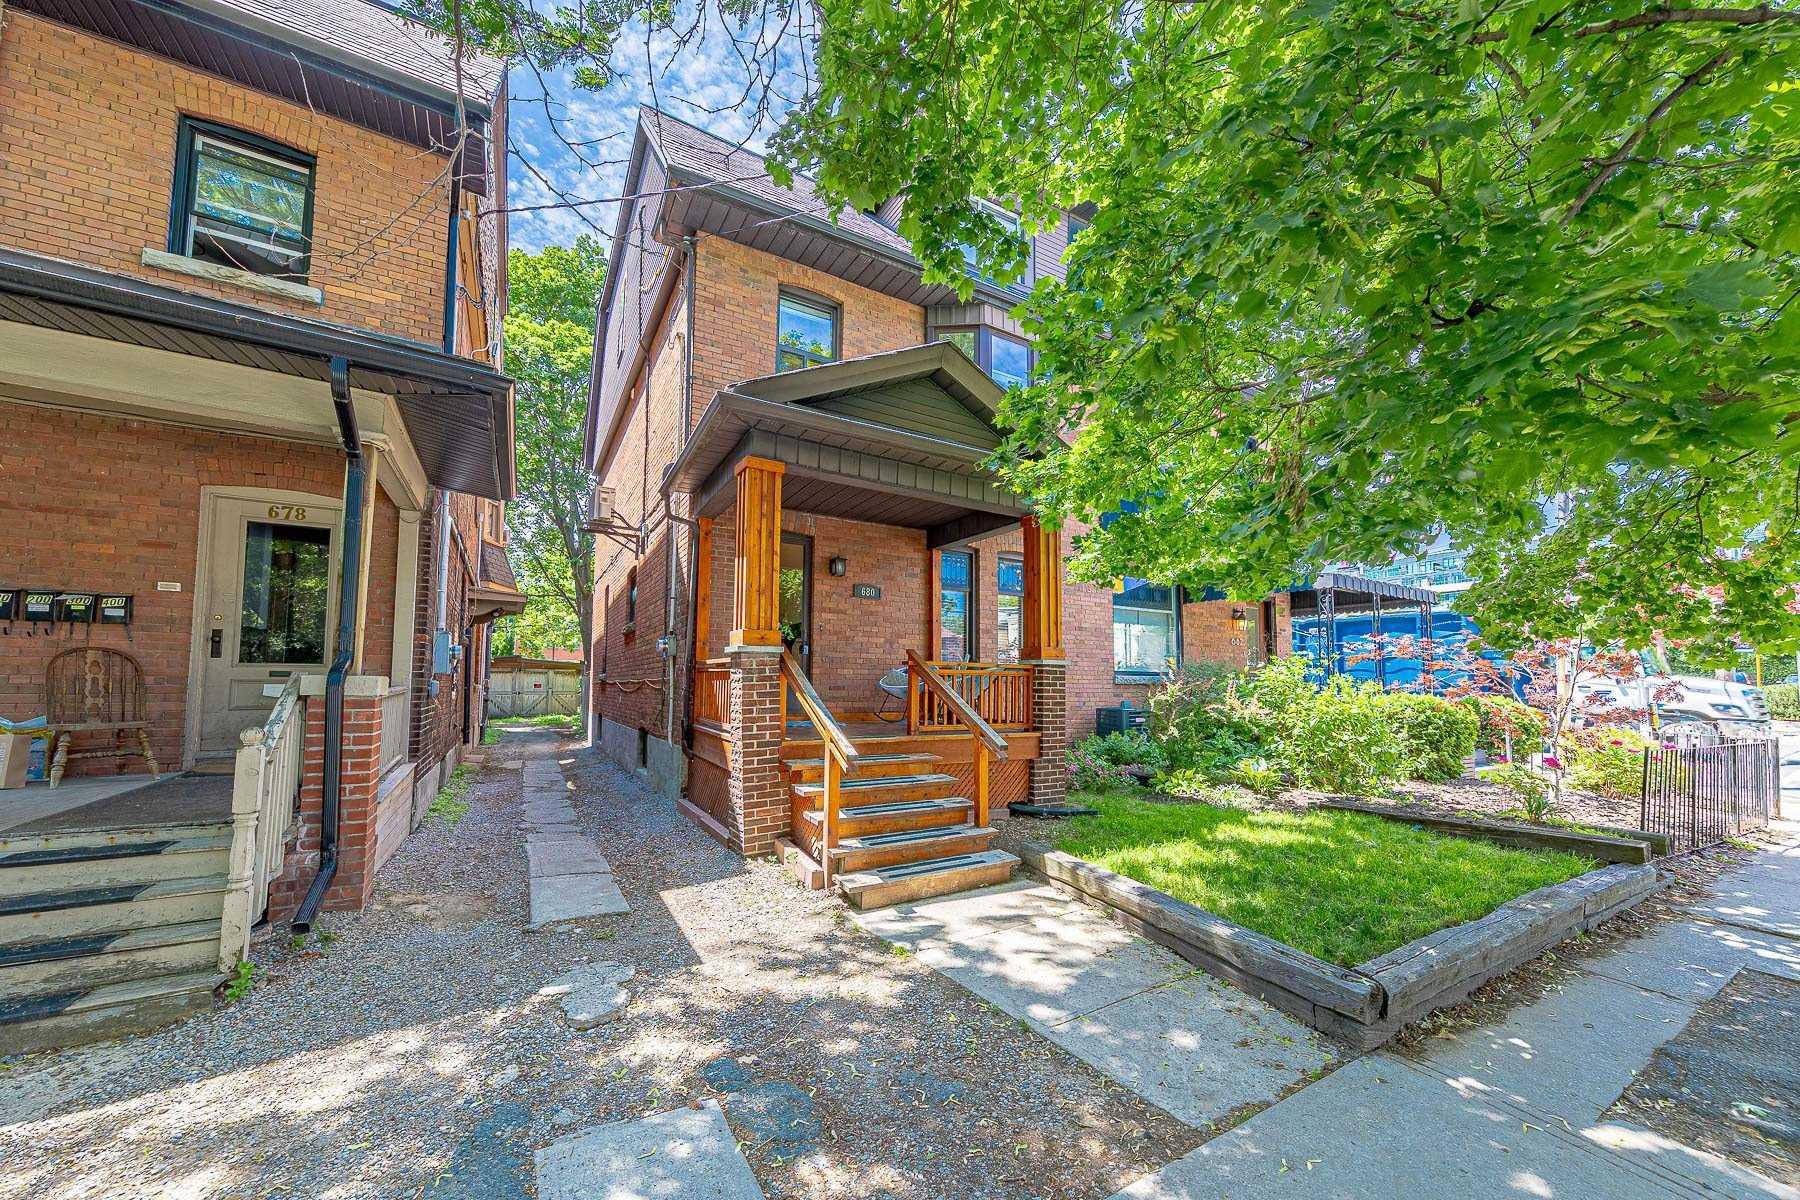 House For Sale 680 Huron St, M5R2R9, Annex, Toronto